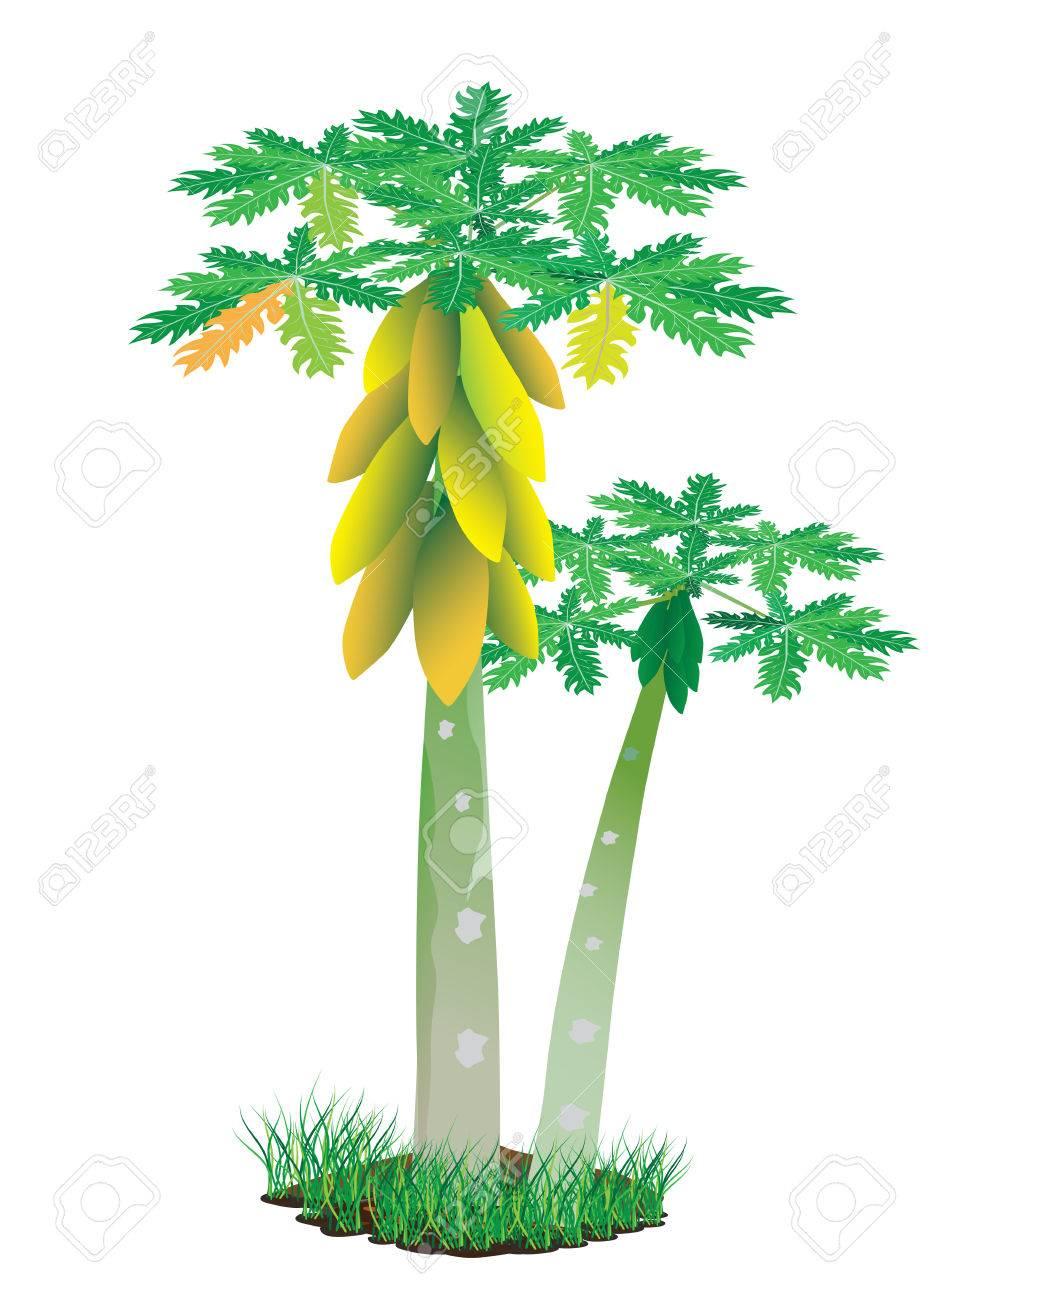 papaya plant vector design - 41200629